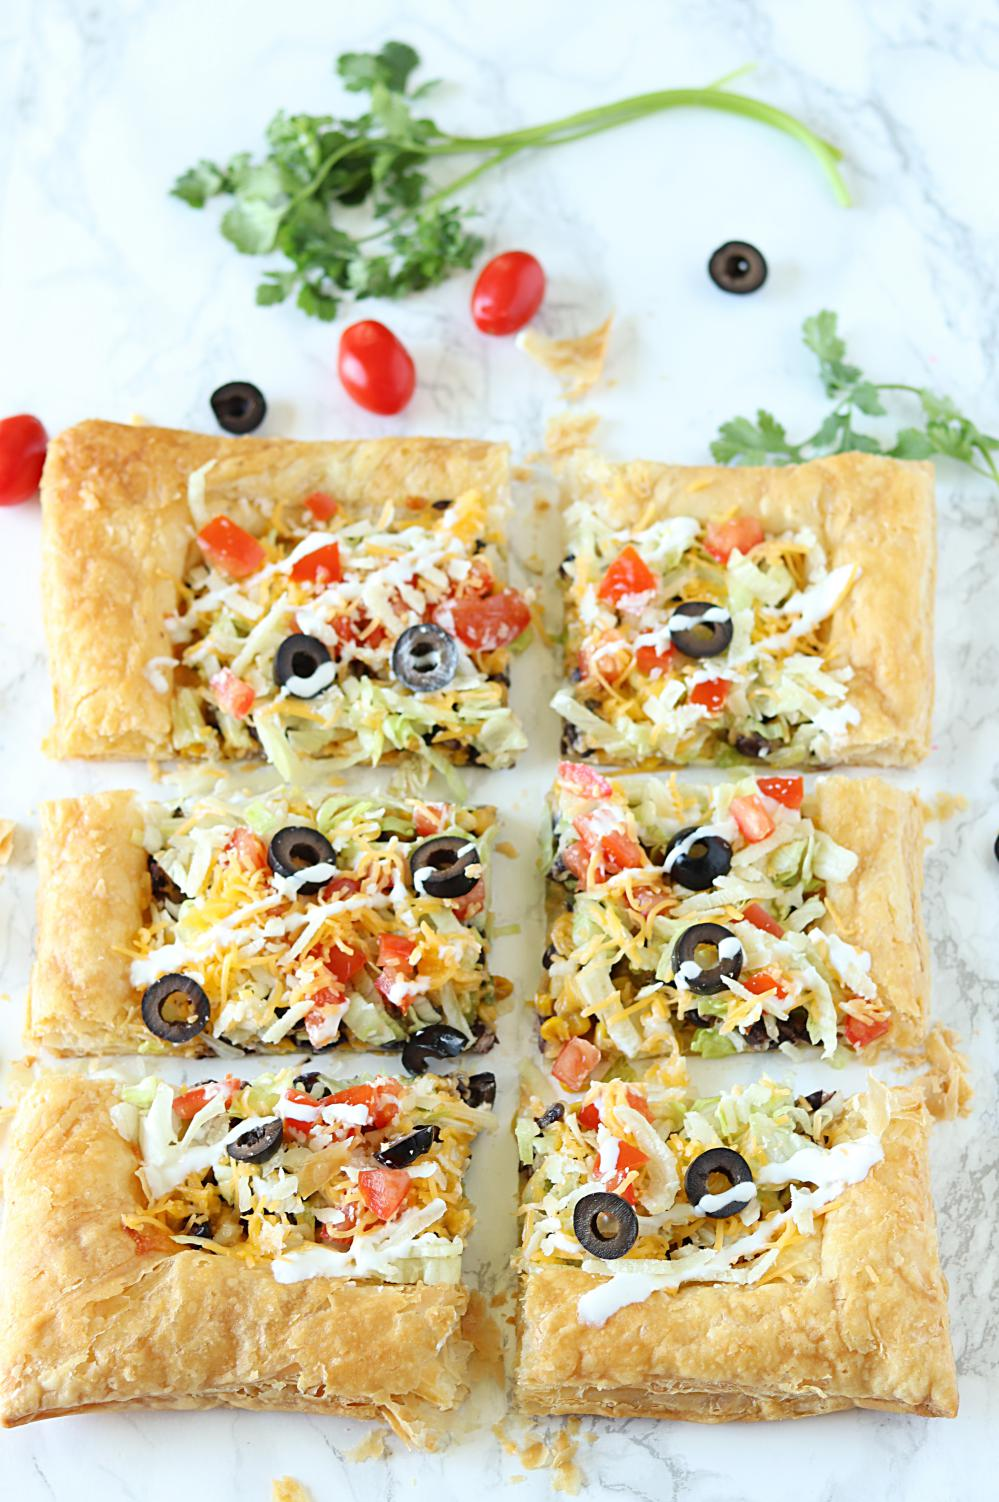 Crispy and flaky Easy Puff Pastry Taco Pizza